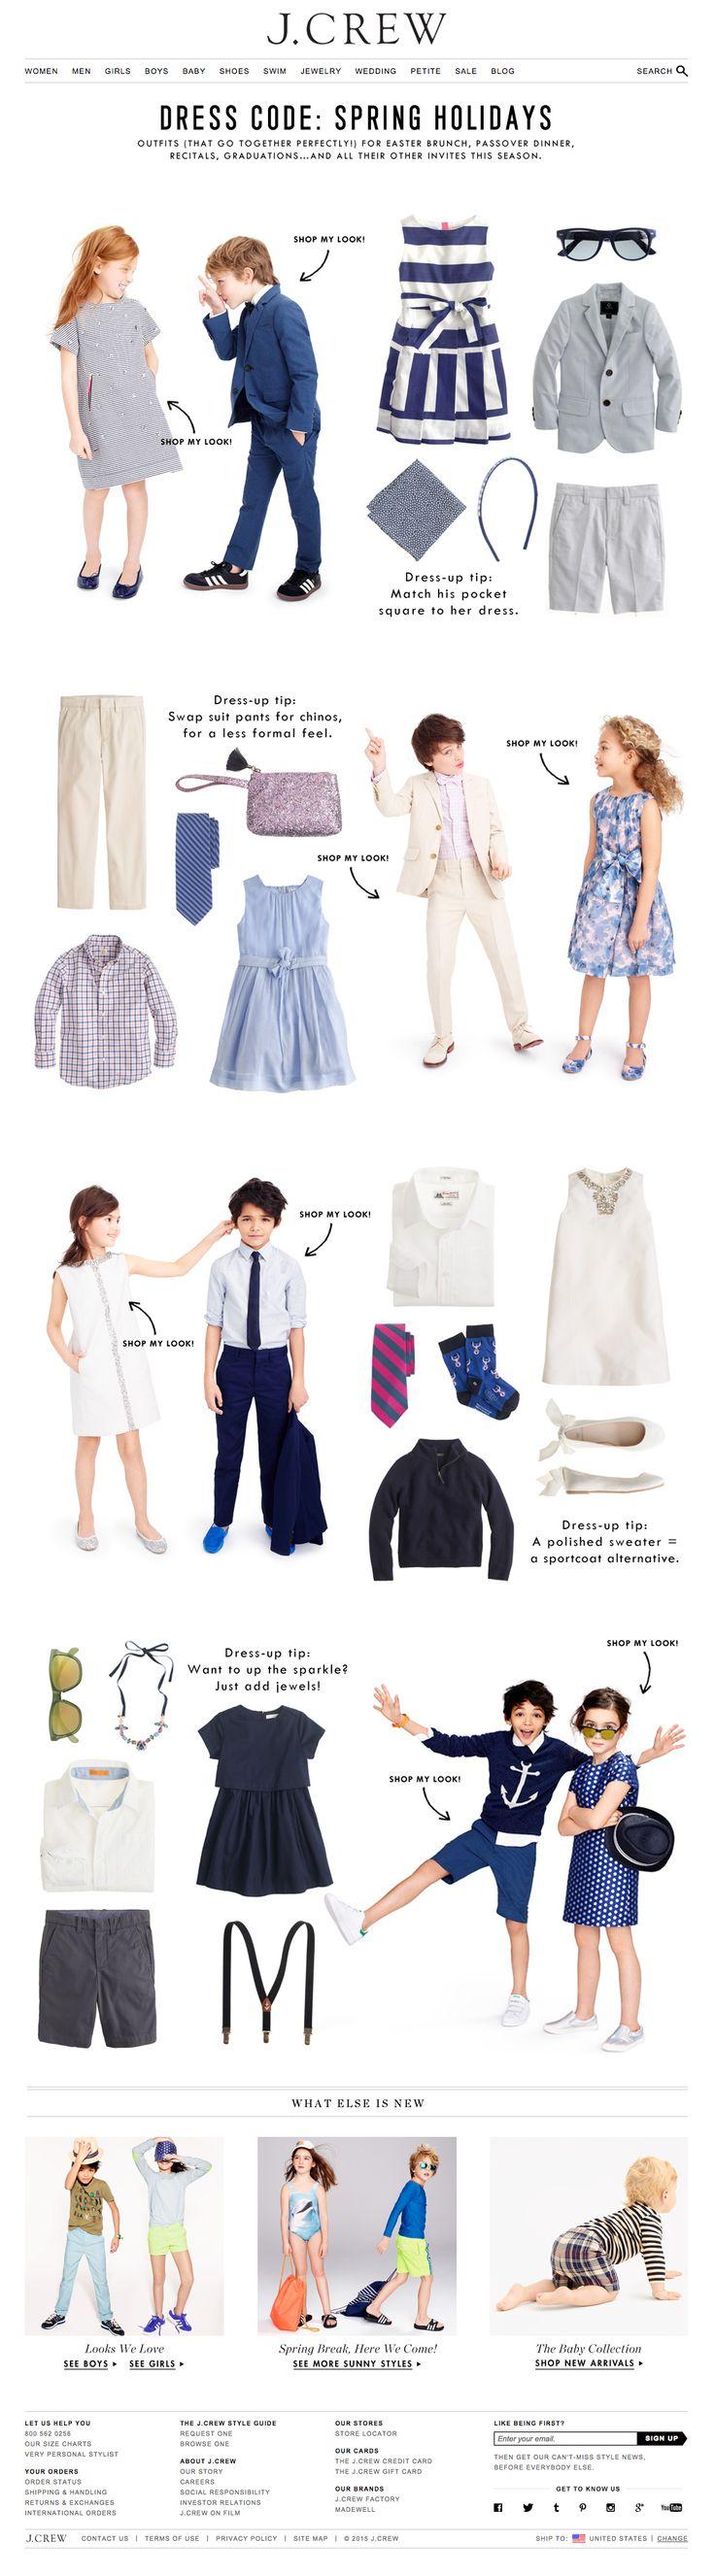 j crew dress code